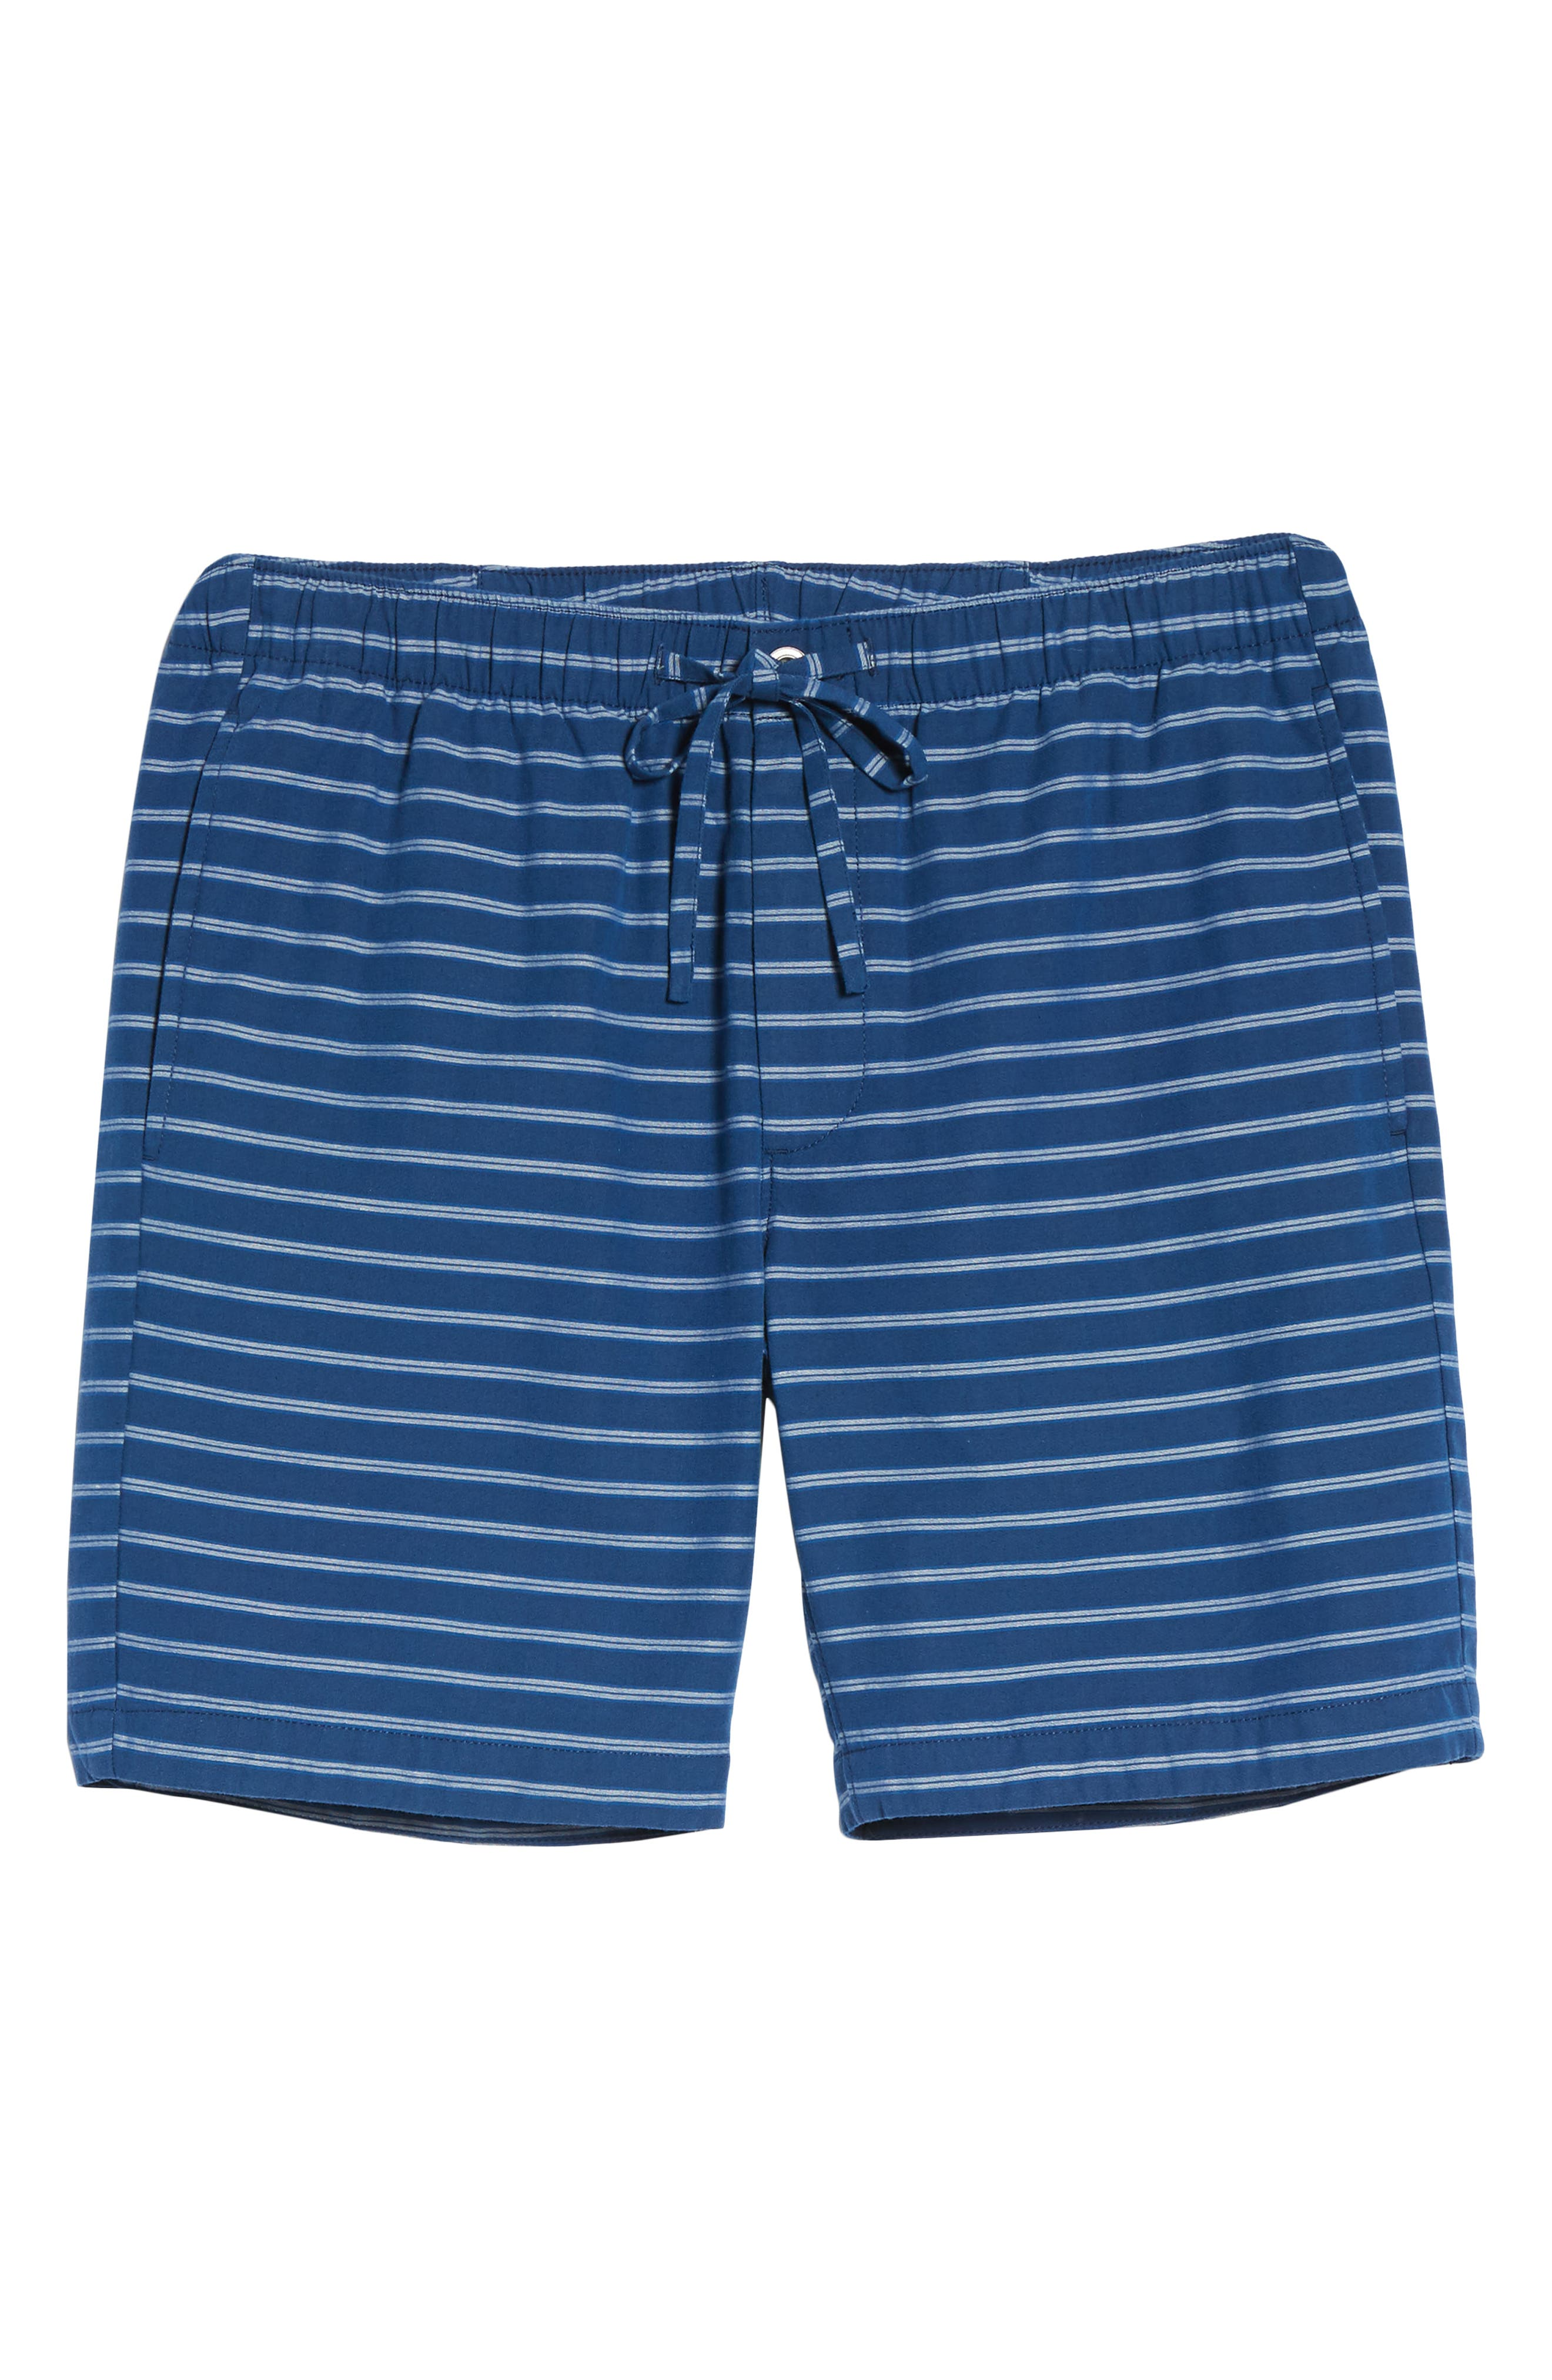 Slim Fit Stripe Beach Shorts,                             Alternate thumbnail 6, color,                             400